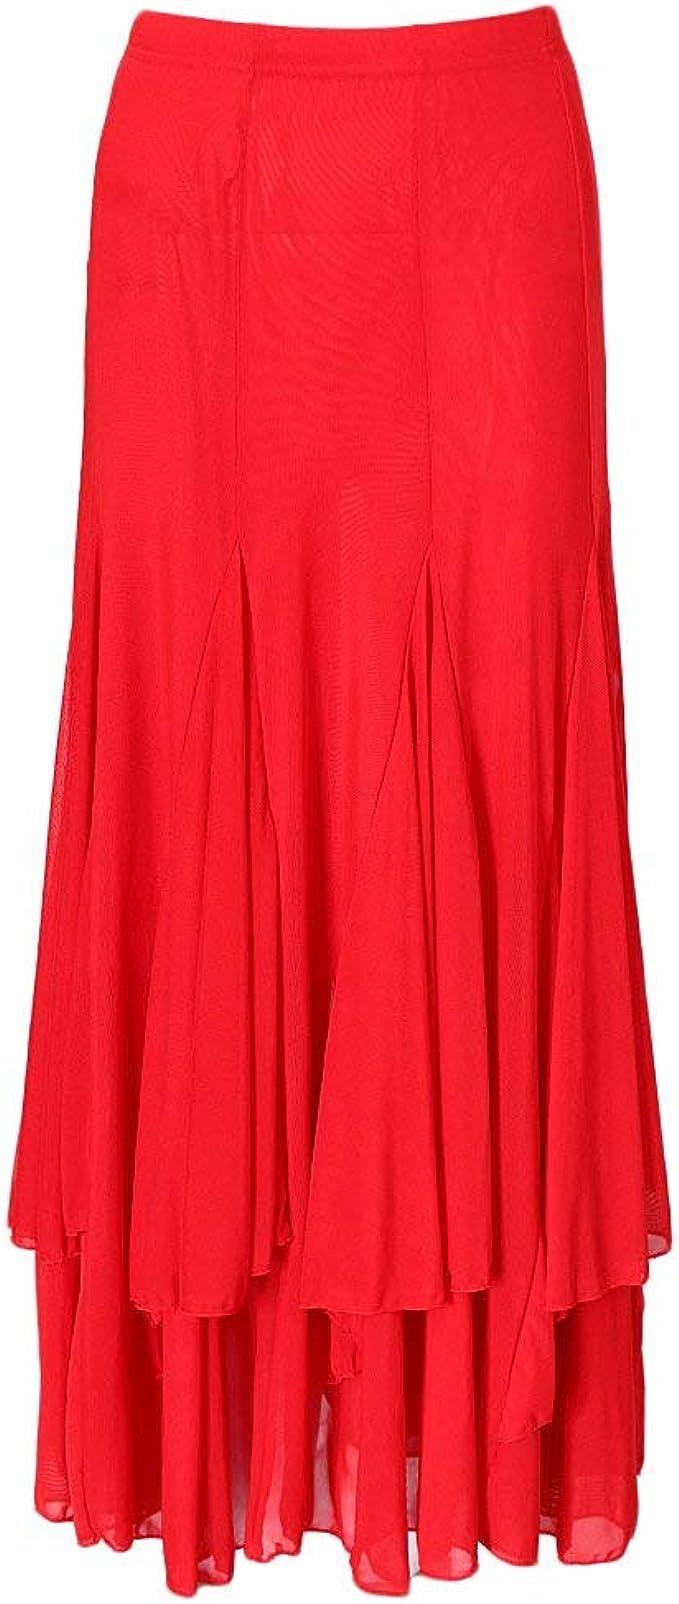 Faldas para Mujer Falda Moda Casual Verano De para Mujer Moda ...